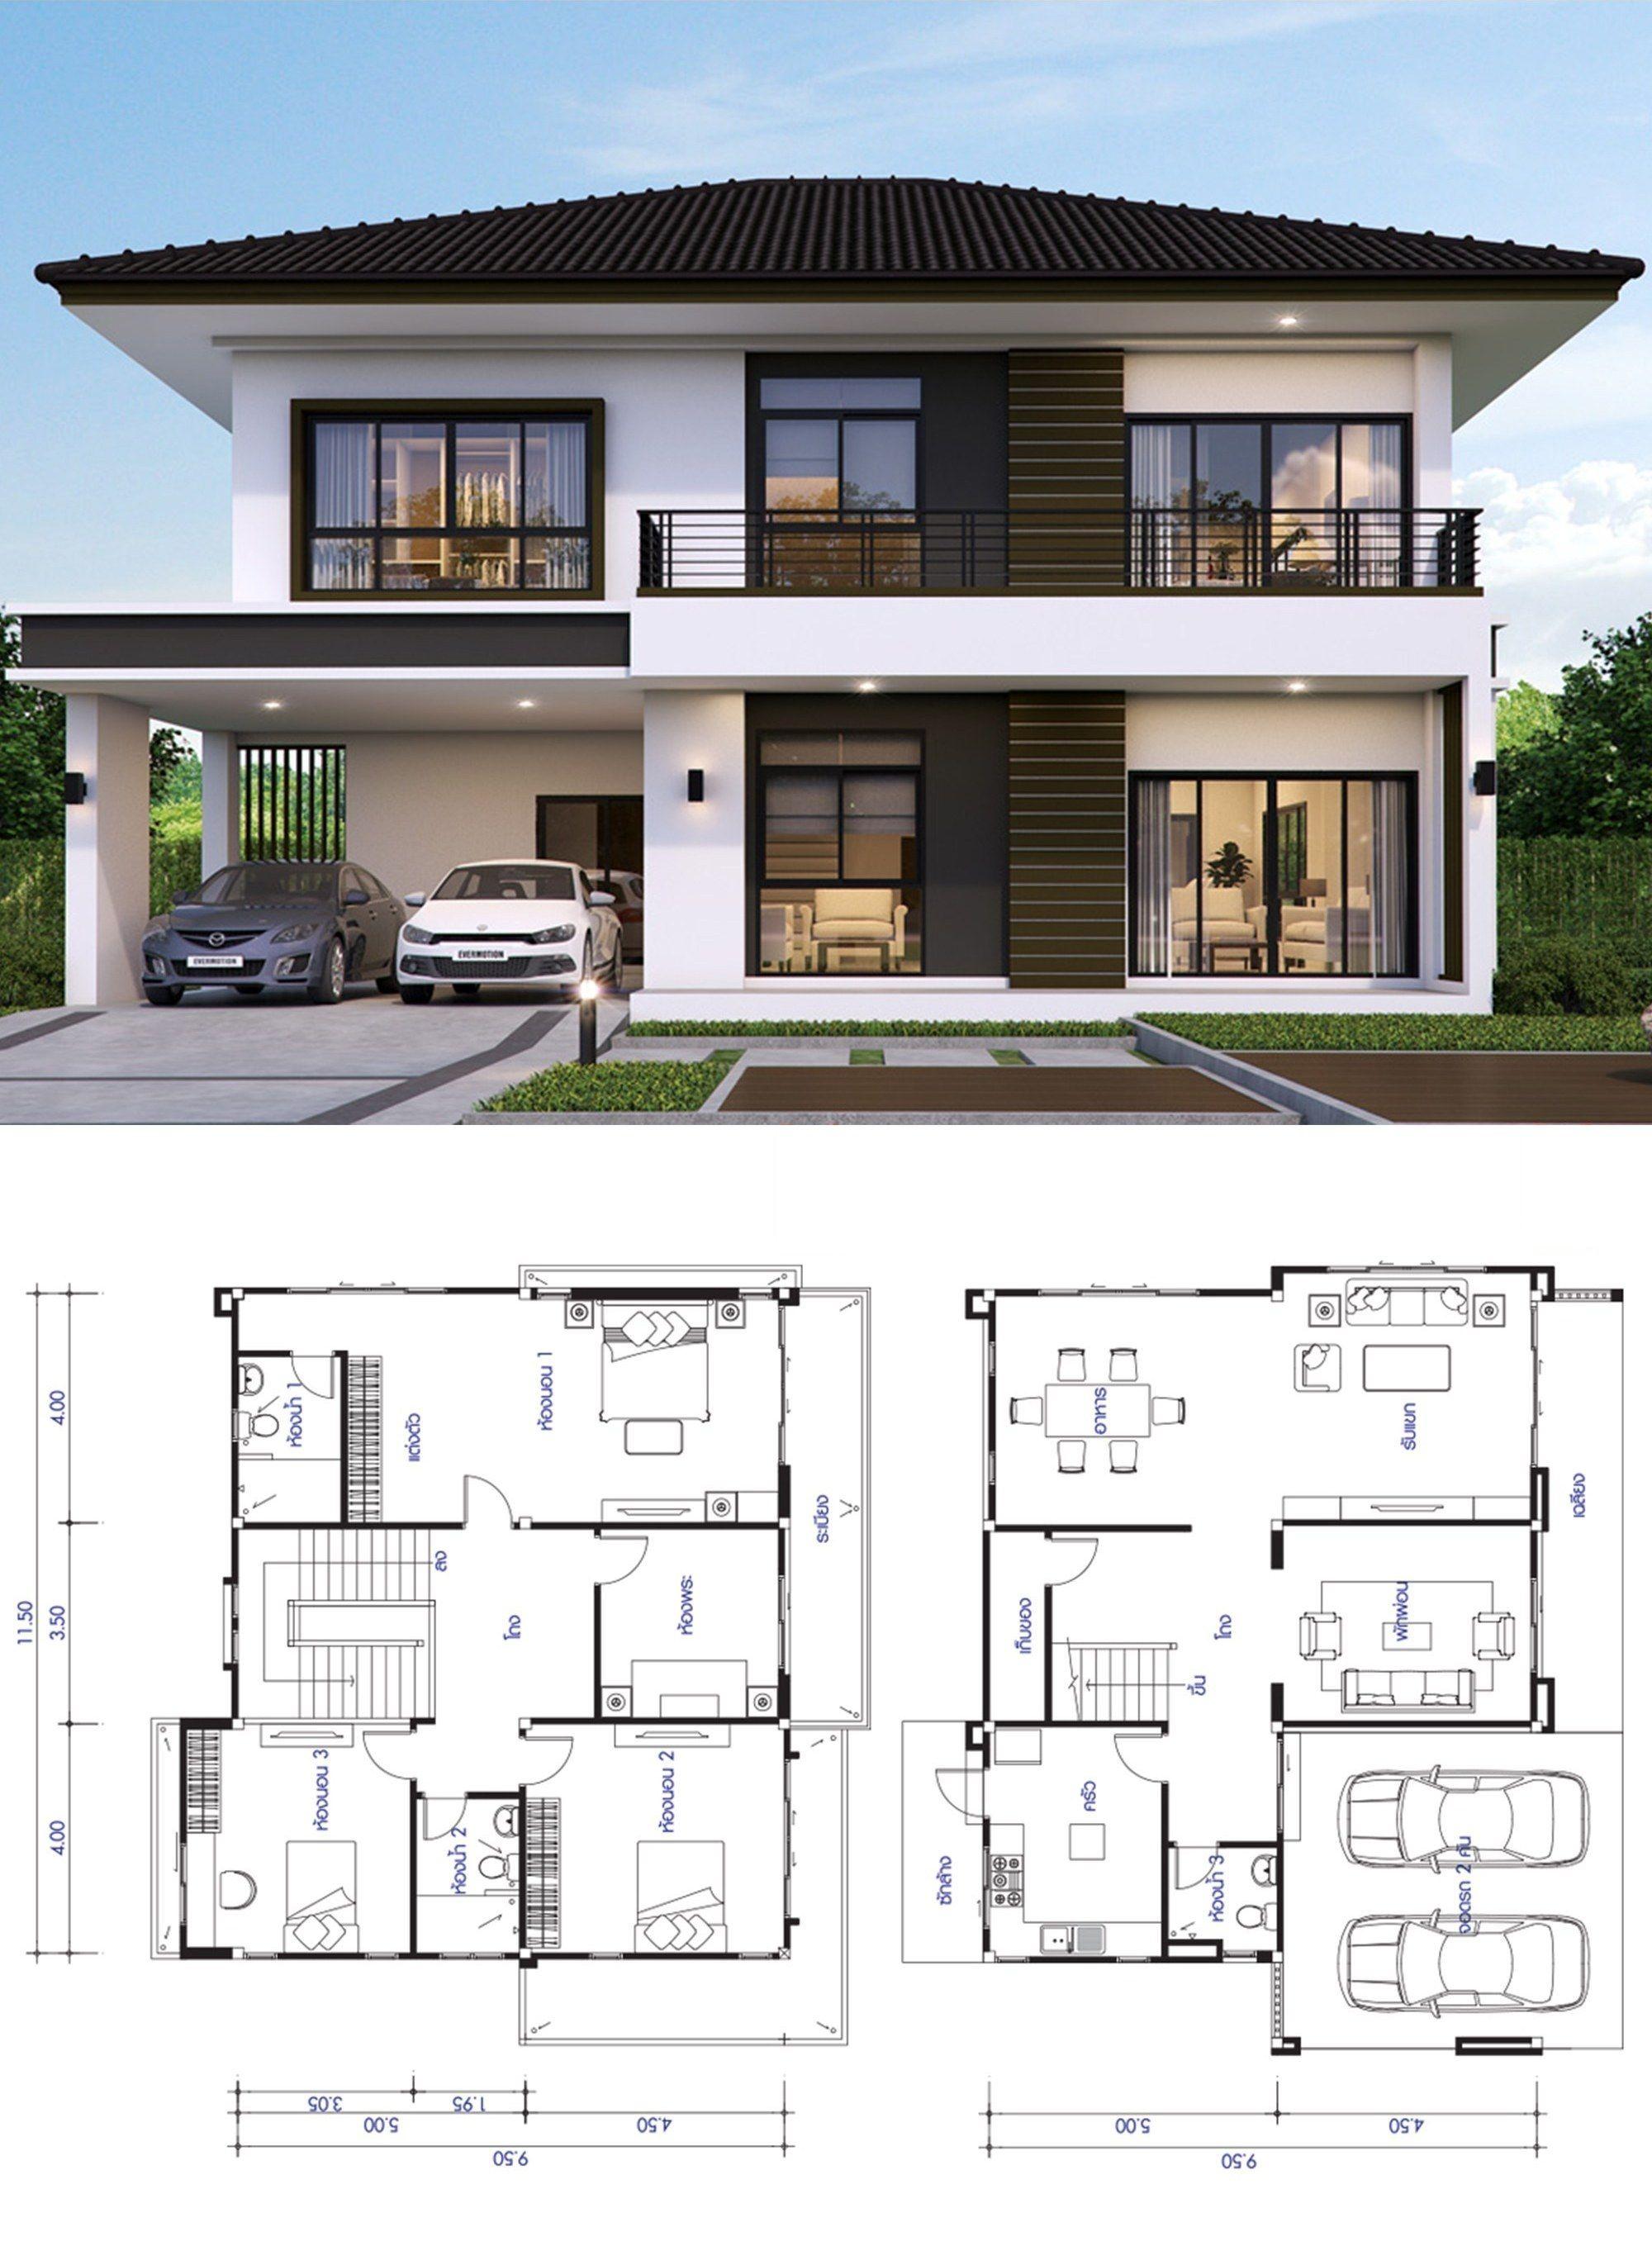 Casa De 2 Pisos 13m X 9 5m Planos De Casas Mediterraneas Fachada De Casas Bonitas Planos De Casas Hermosas